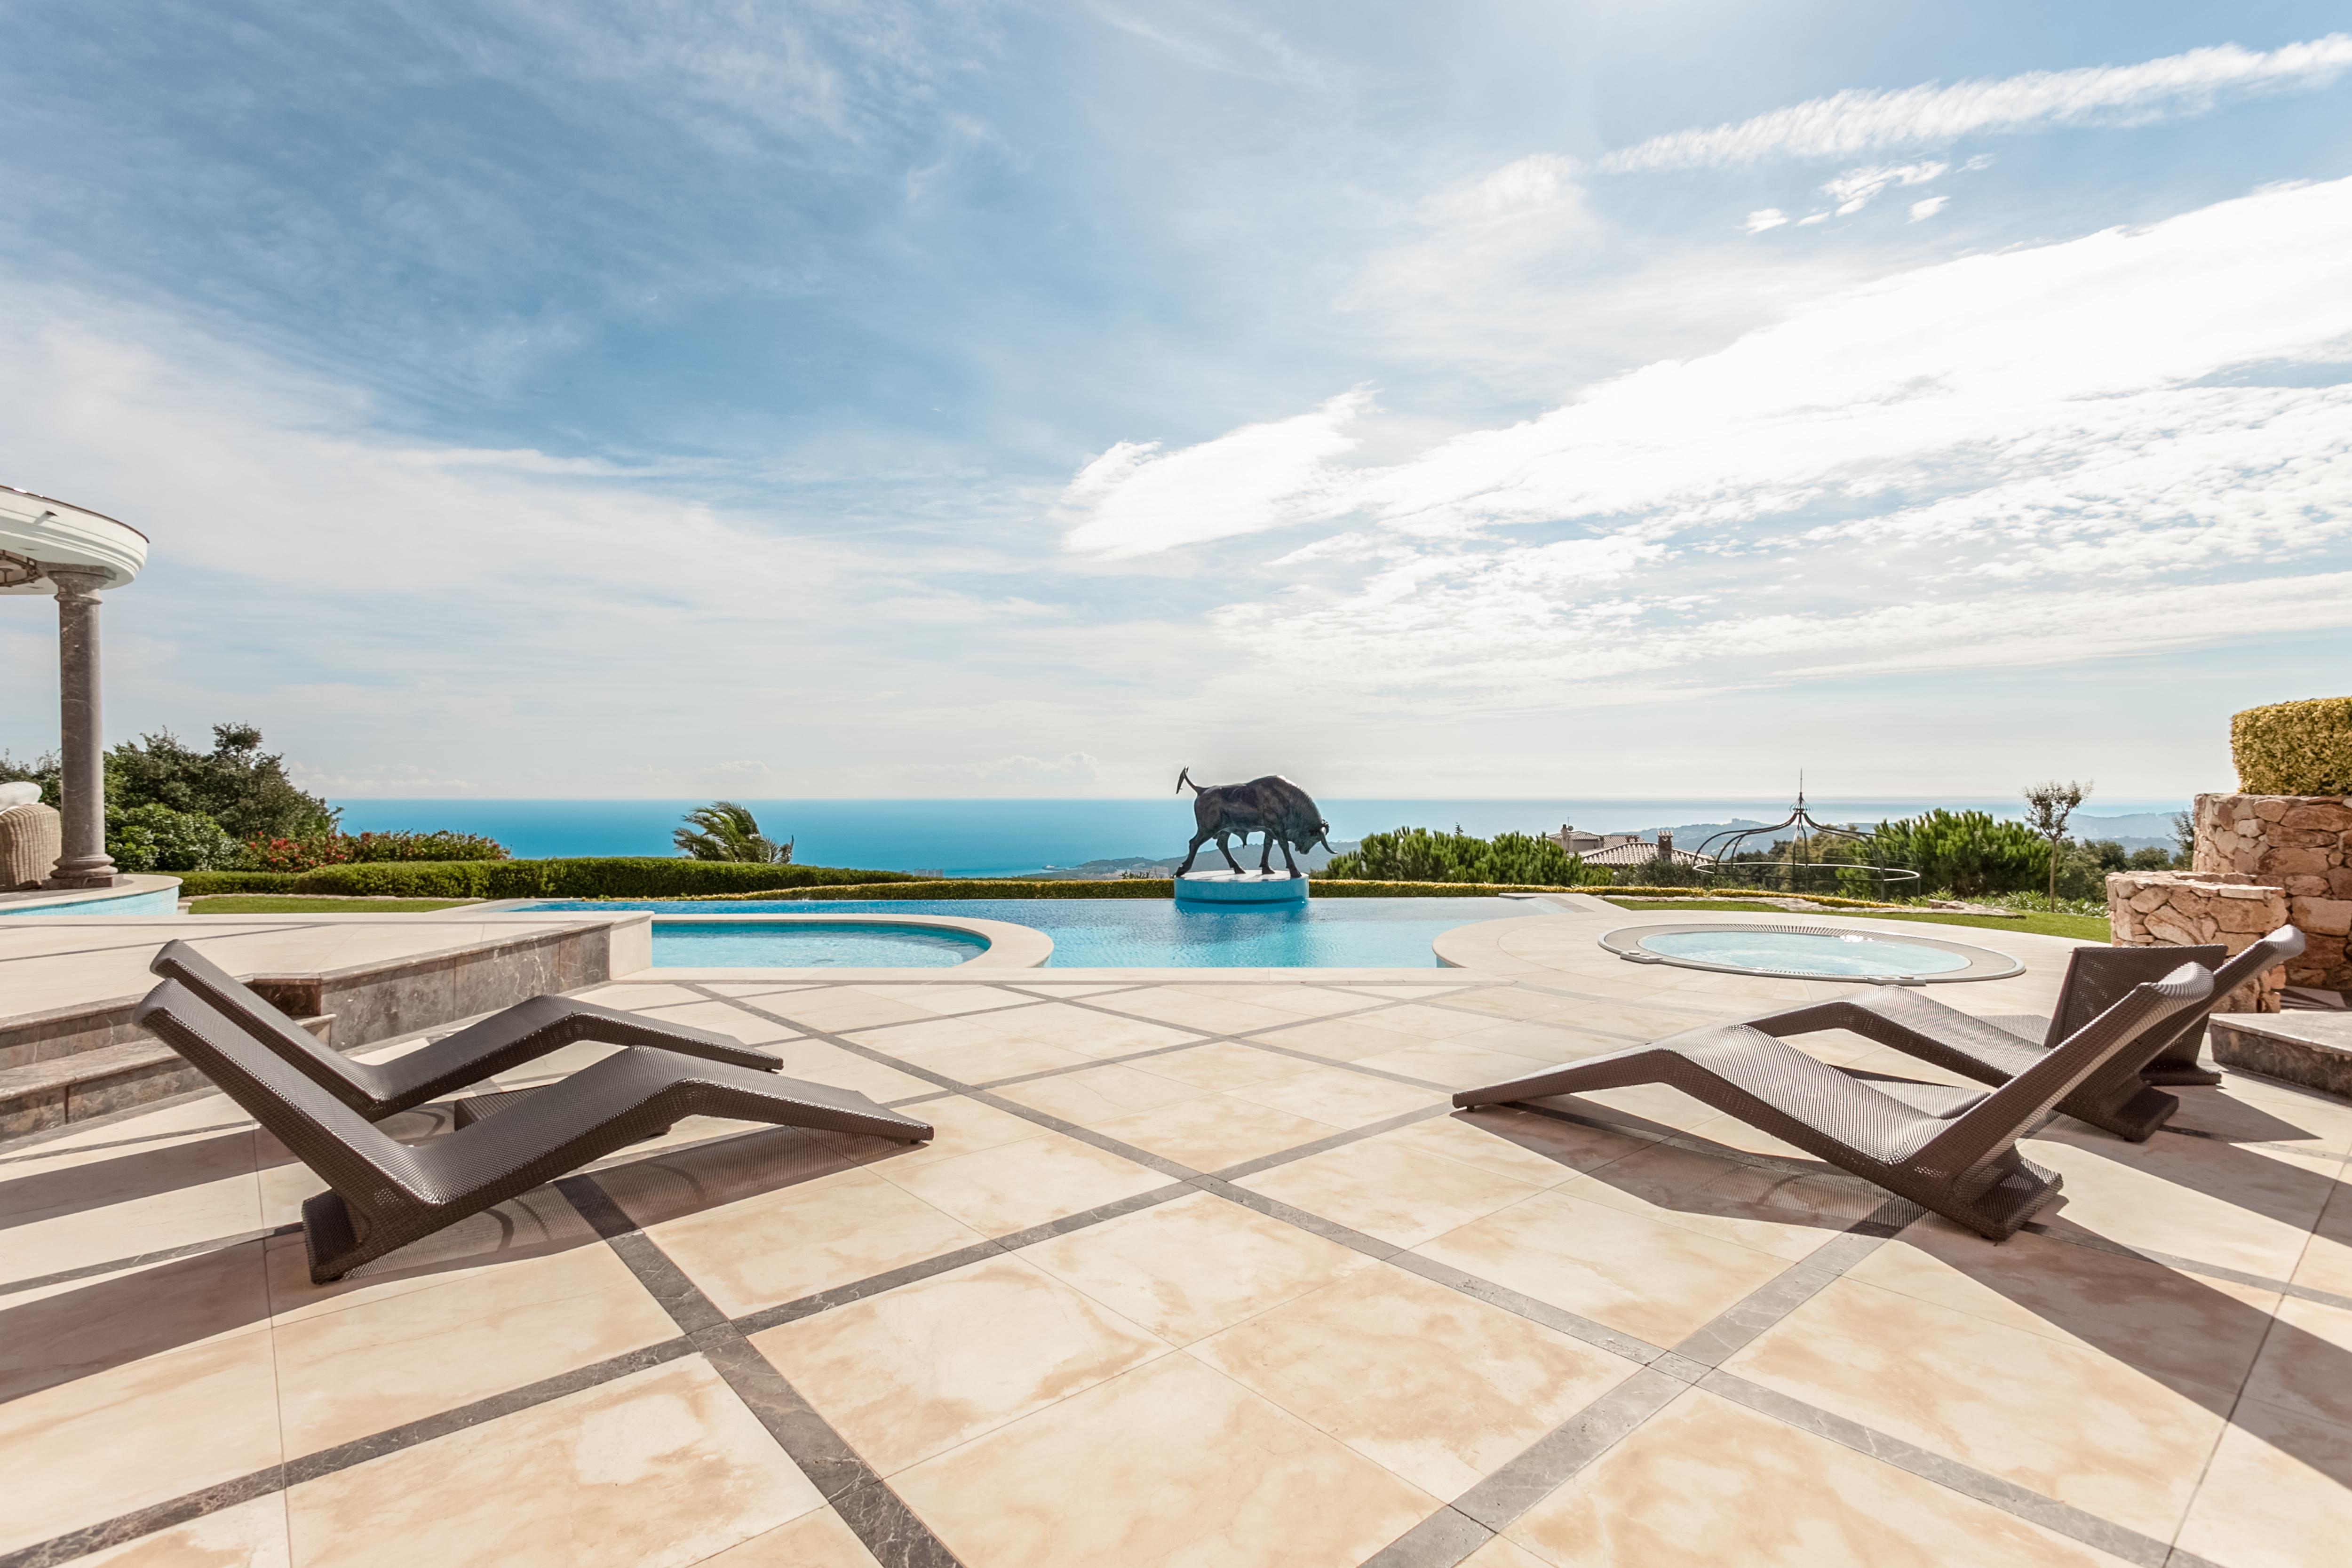 Single Family Home for Sale at Fantastic villa with panoramic sea views Playa De Aro, Costa Brava 17250 Spain